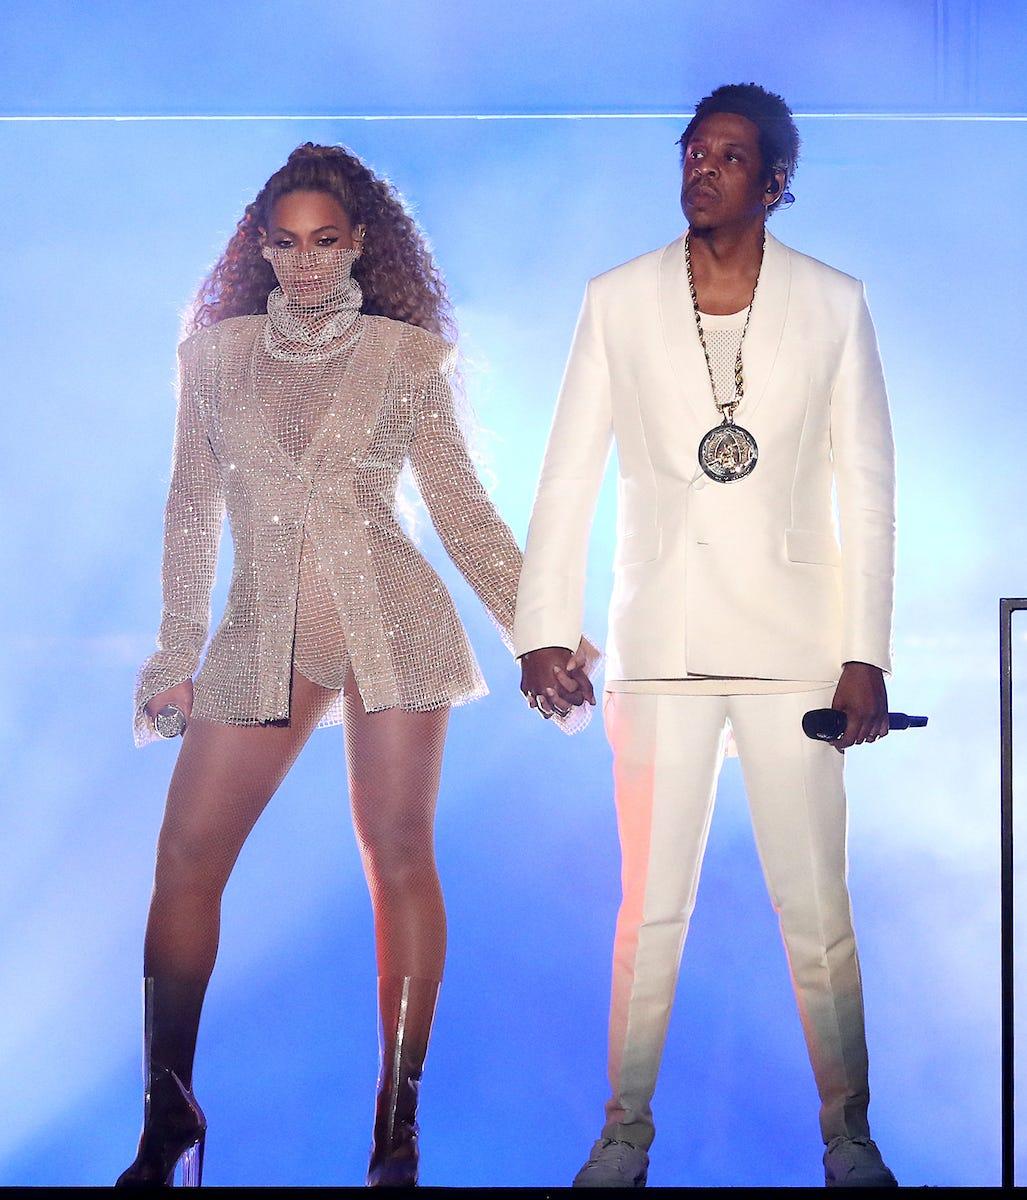 Grammys 2019 minute-by-minute rundown: Beyonce, Jay-Z, Ariana Grande, Lady Gaga win awards